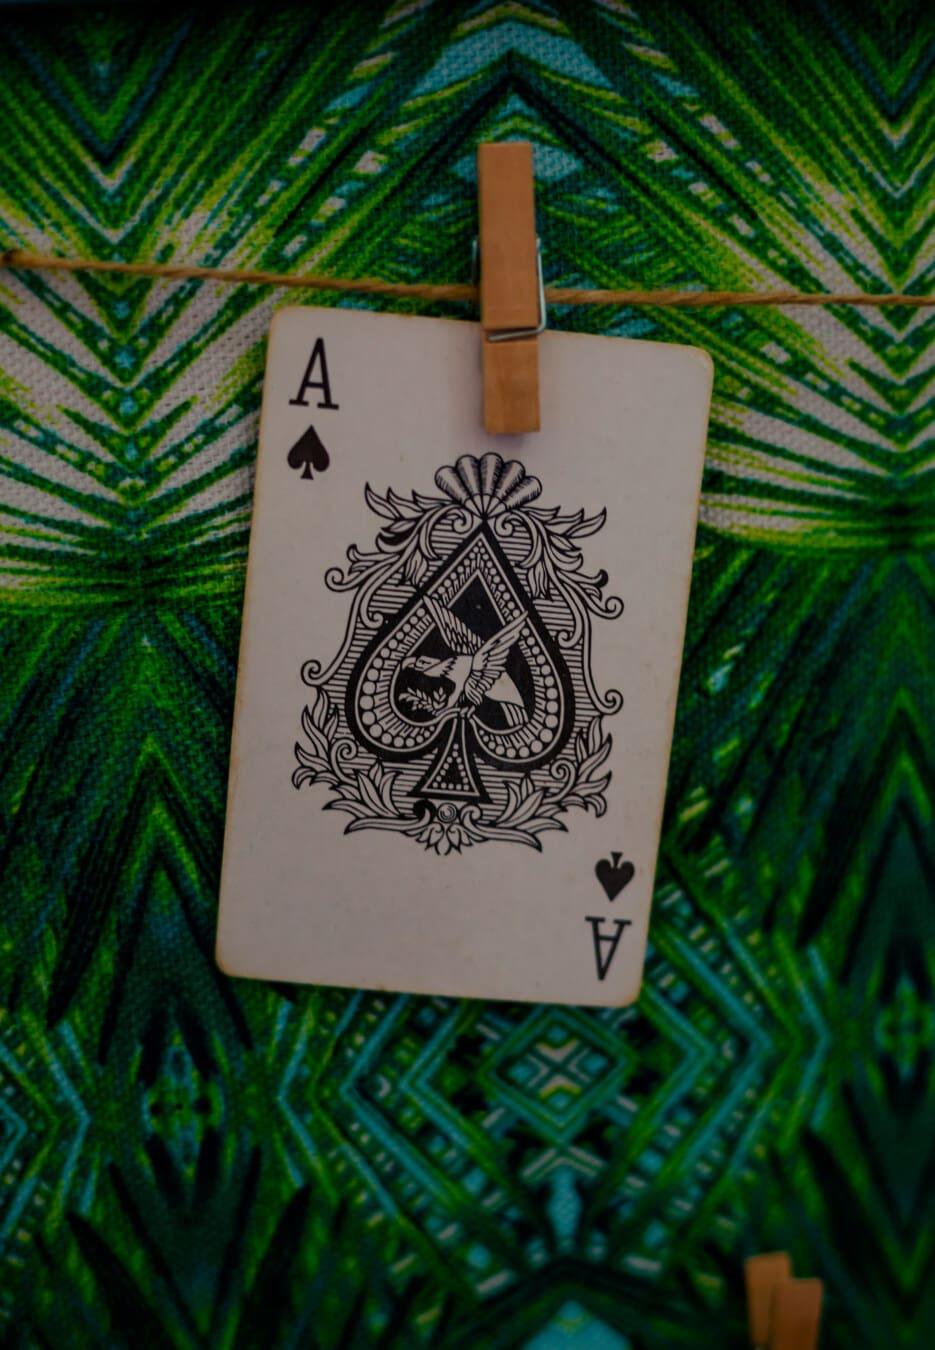 card, aces, hanging, game, casino, paper, black and white, decoration, interior design, art